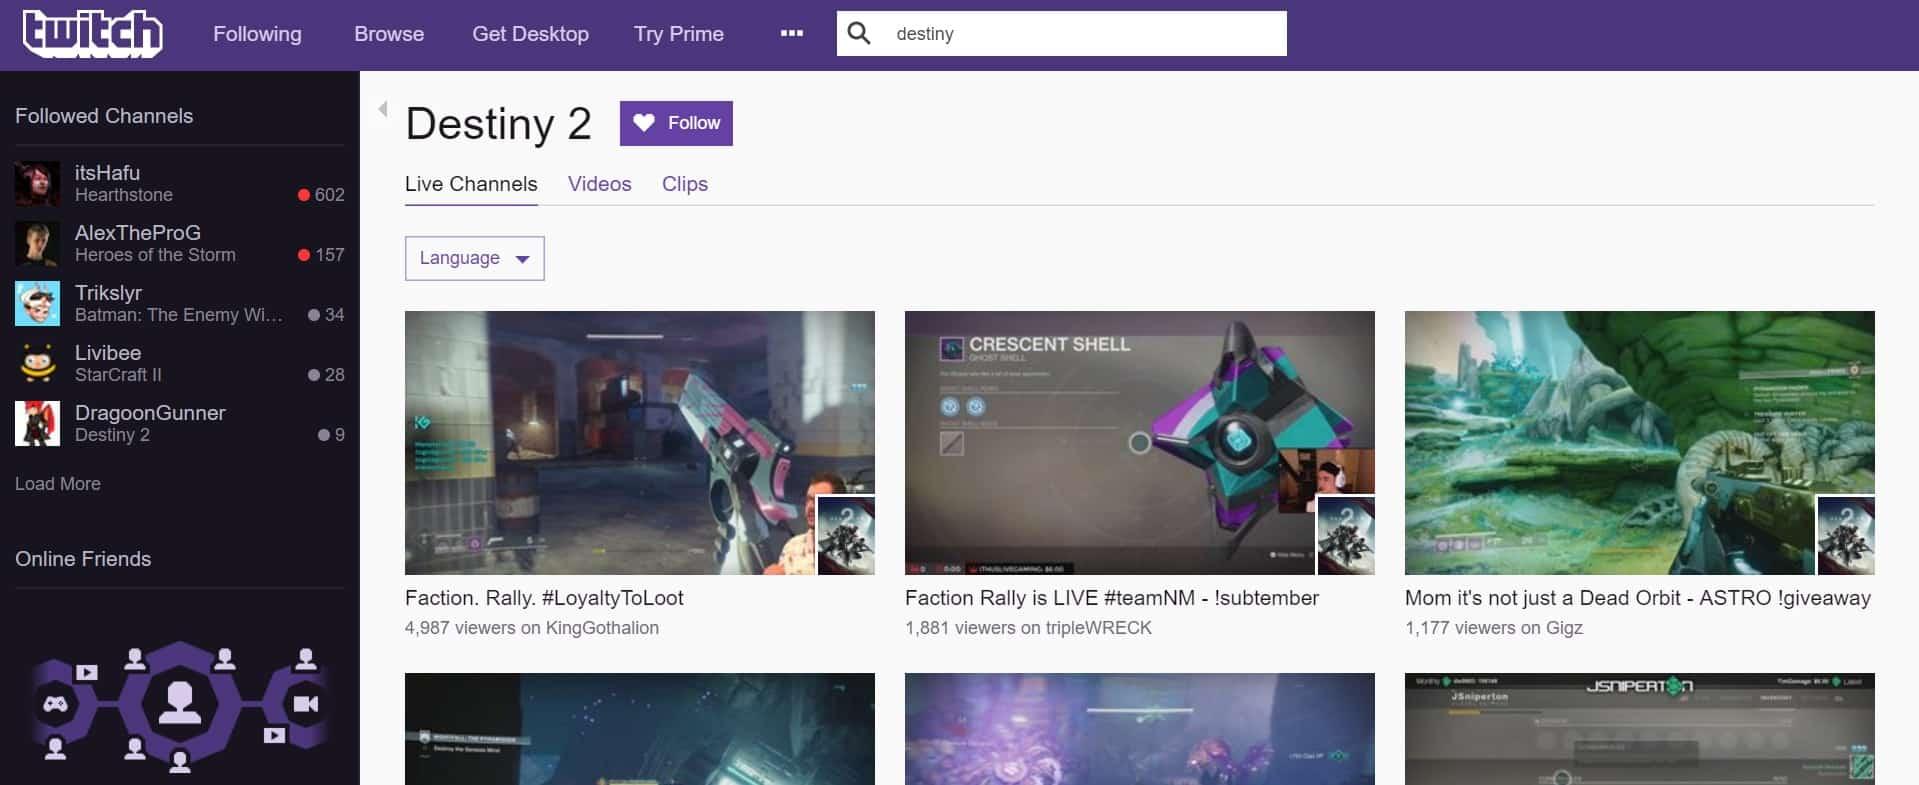 Destiny 2 Boosting now streamed